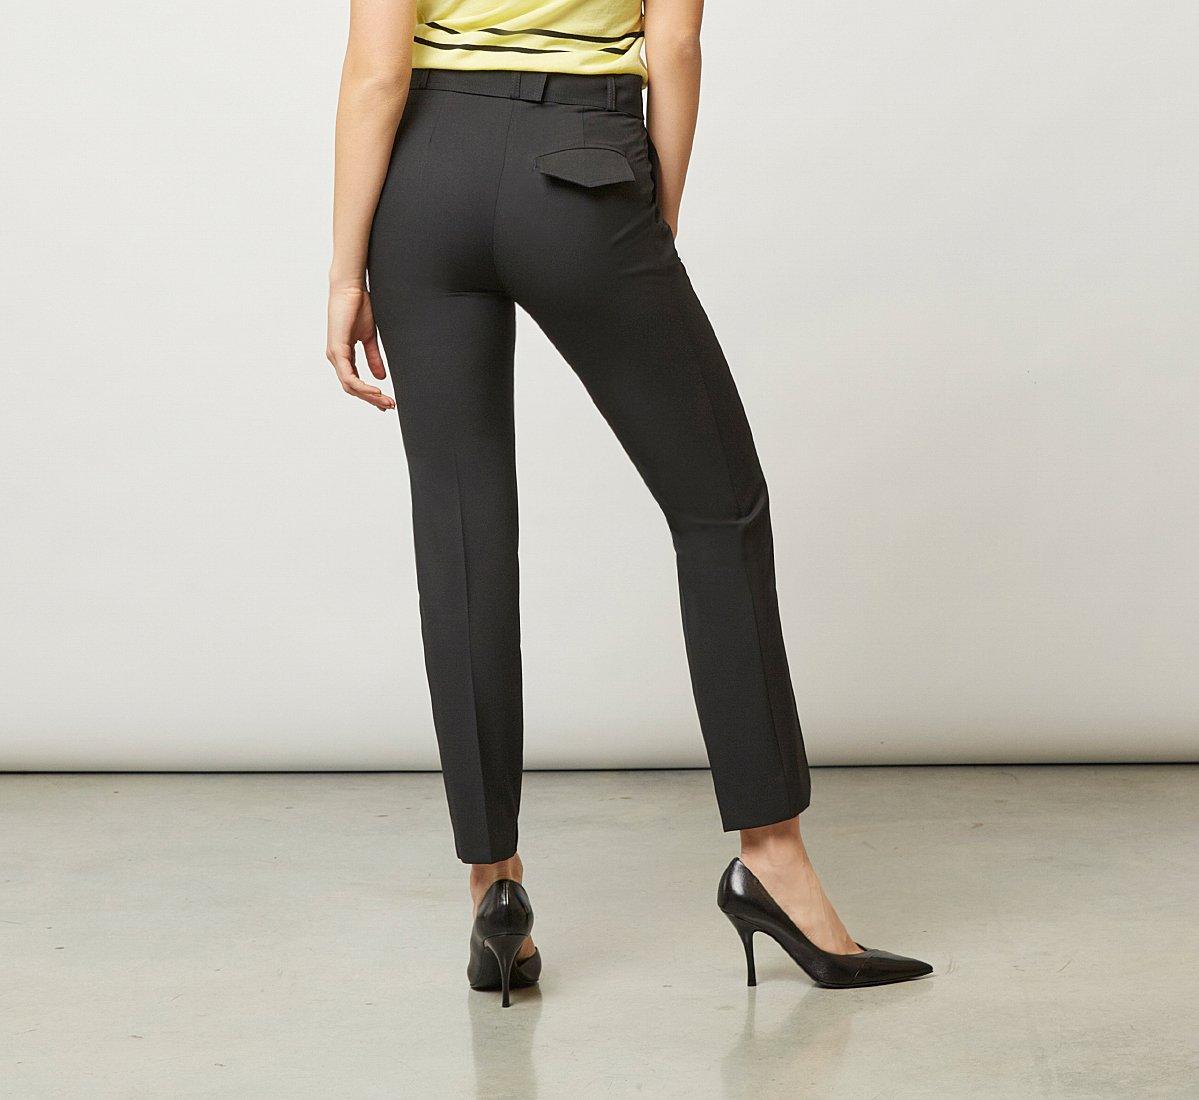 Pantalone linea classica